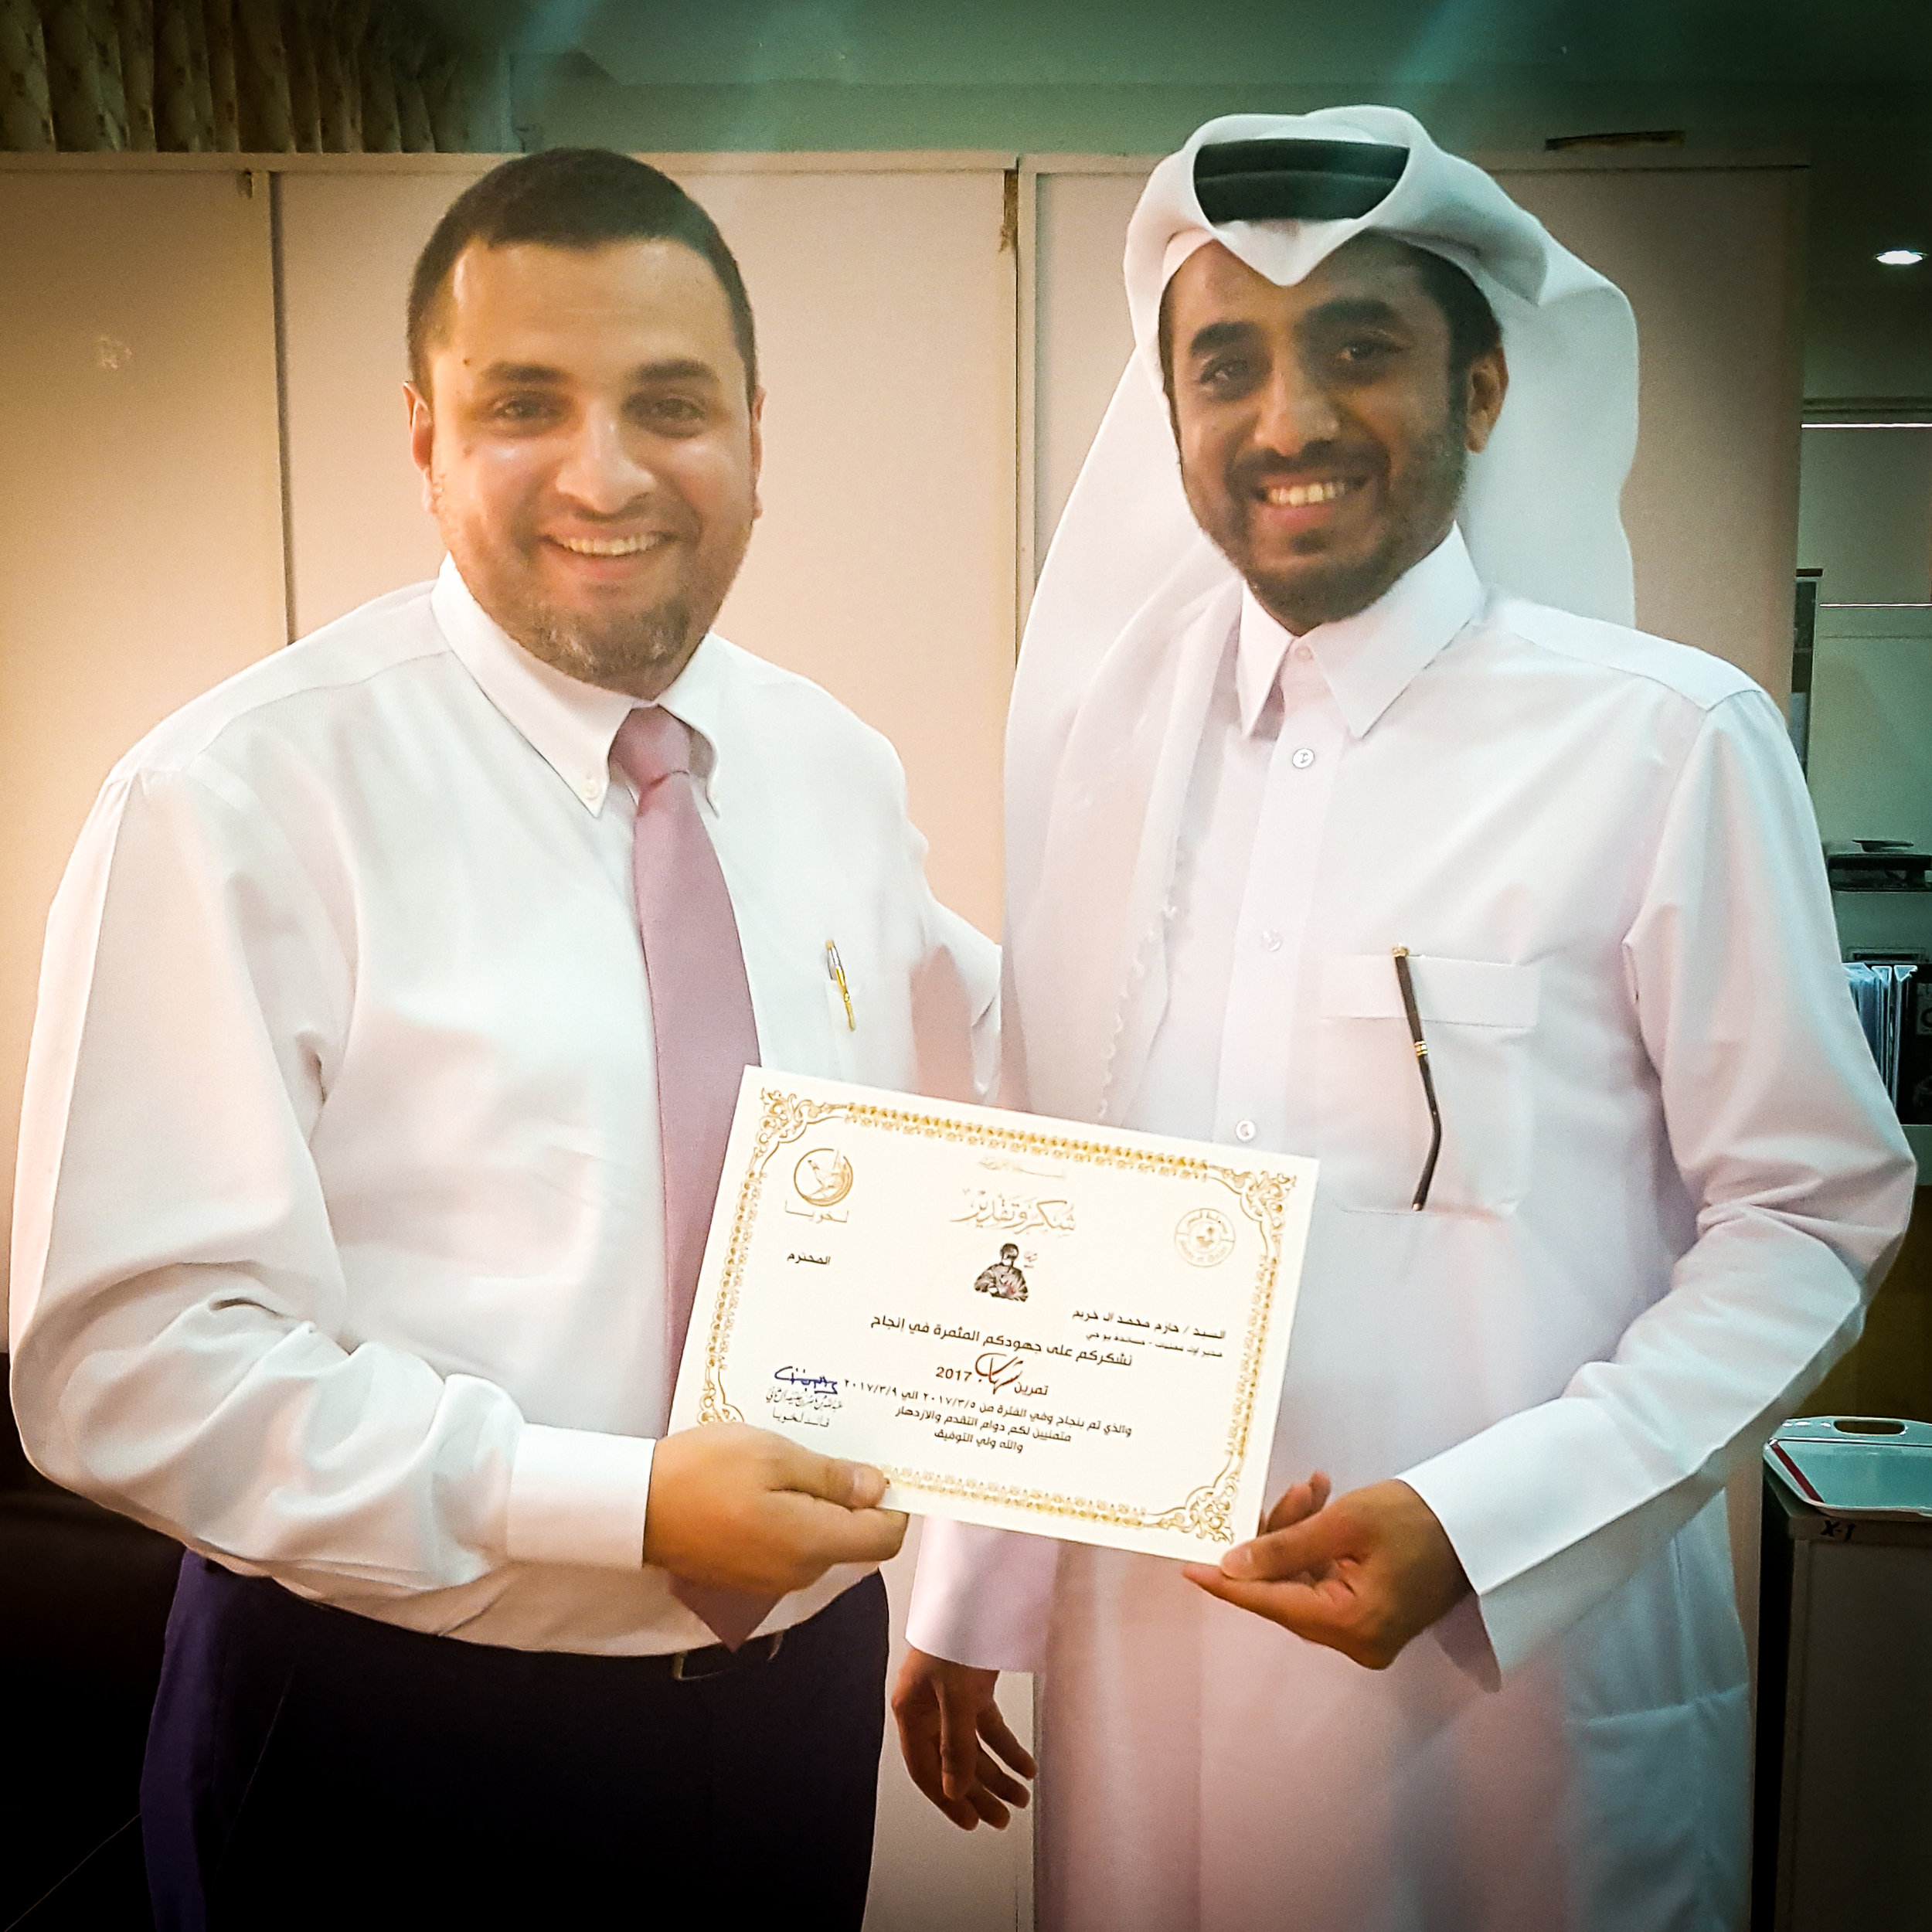 Hazem Khraim (Senior Manager - Operations) receives his certificate from 2nd Lieutenant, Khalid Ali Al-Buainain (Lekhwiya Officer)